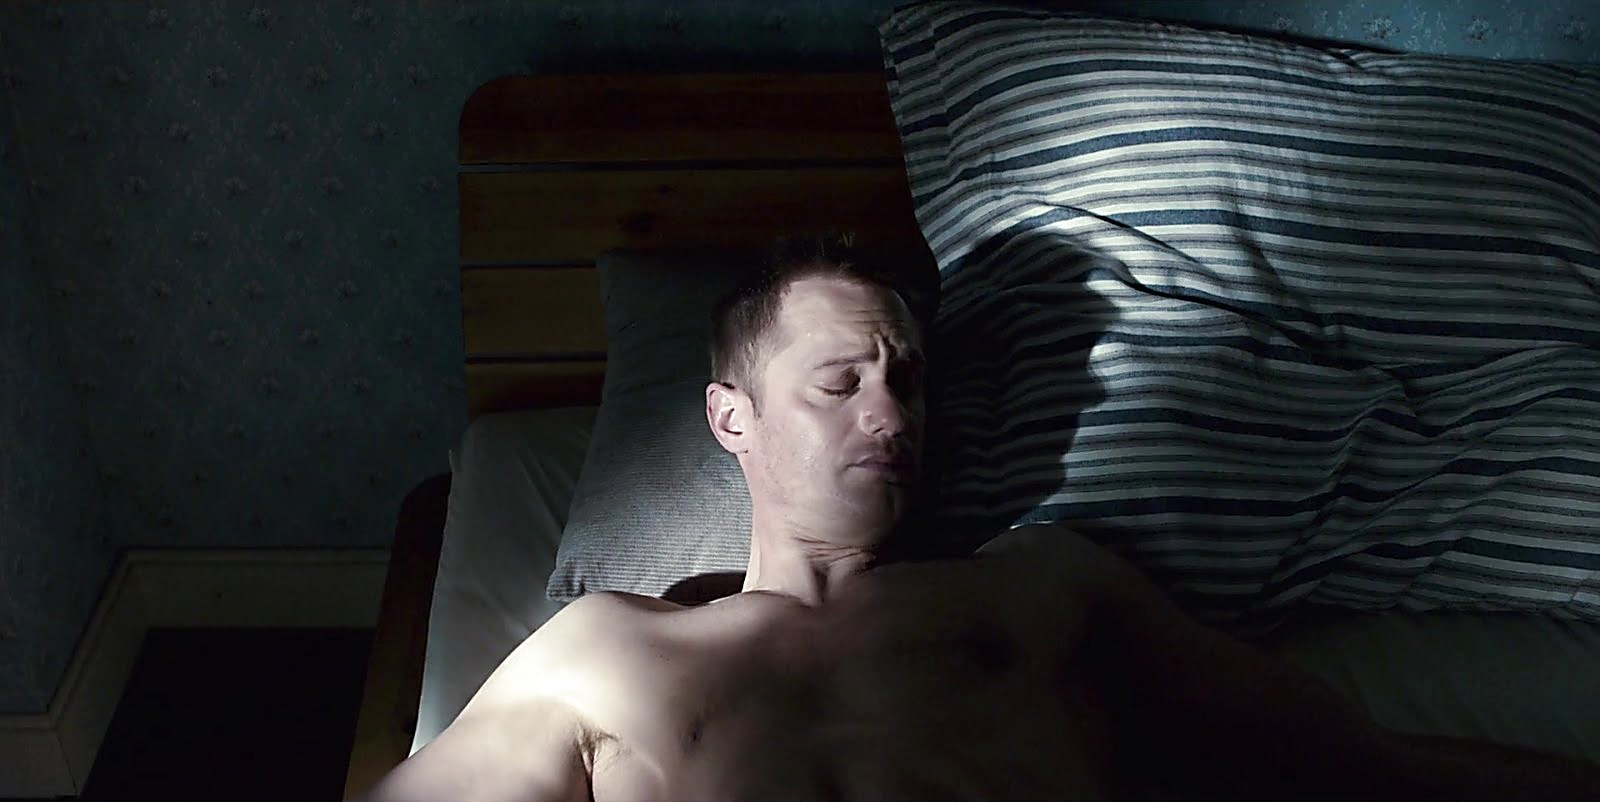 Alexander Skarsgard latest sexy shirtless scene February 24, 2018, 12pm